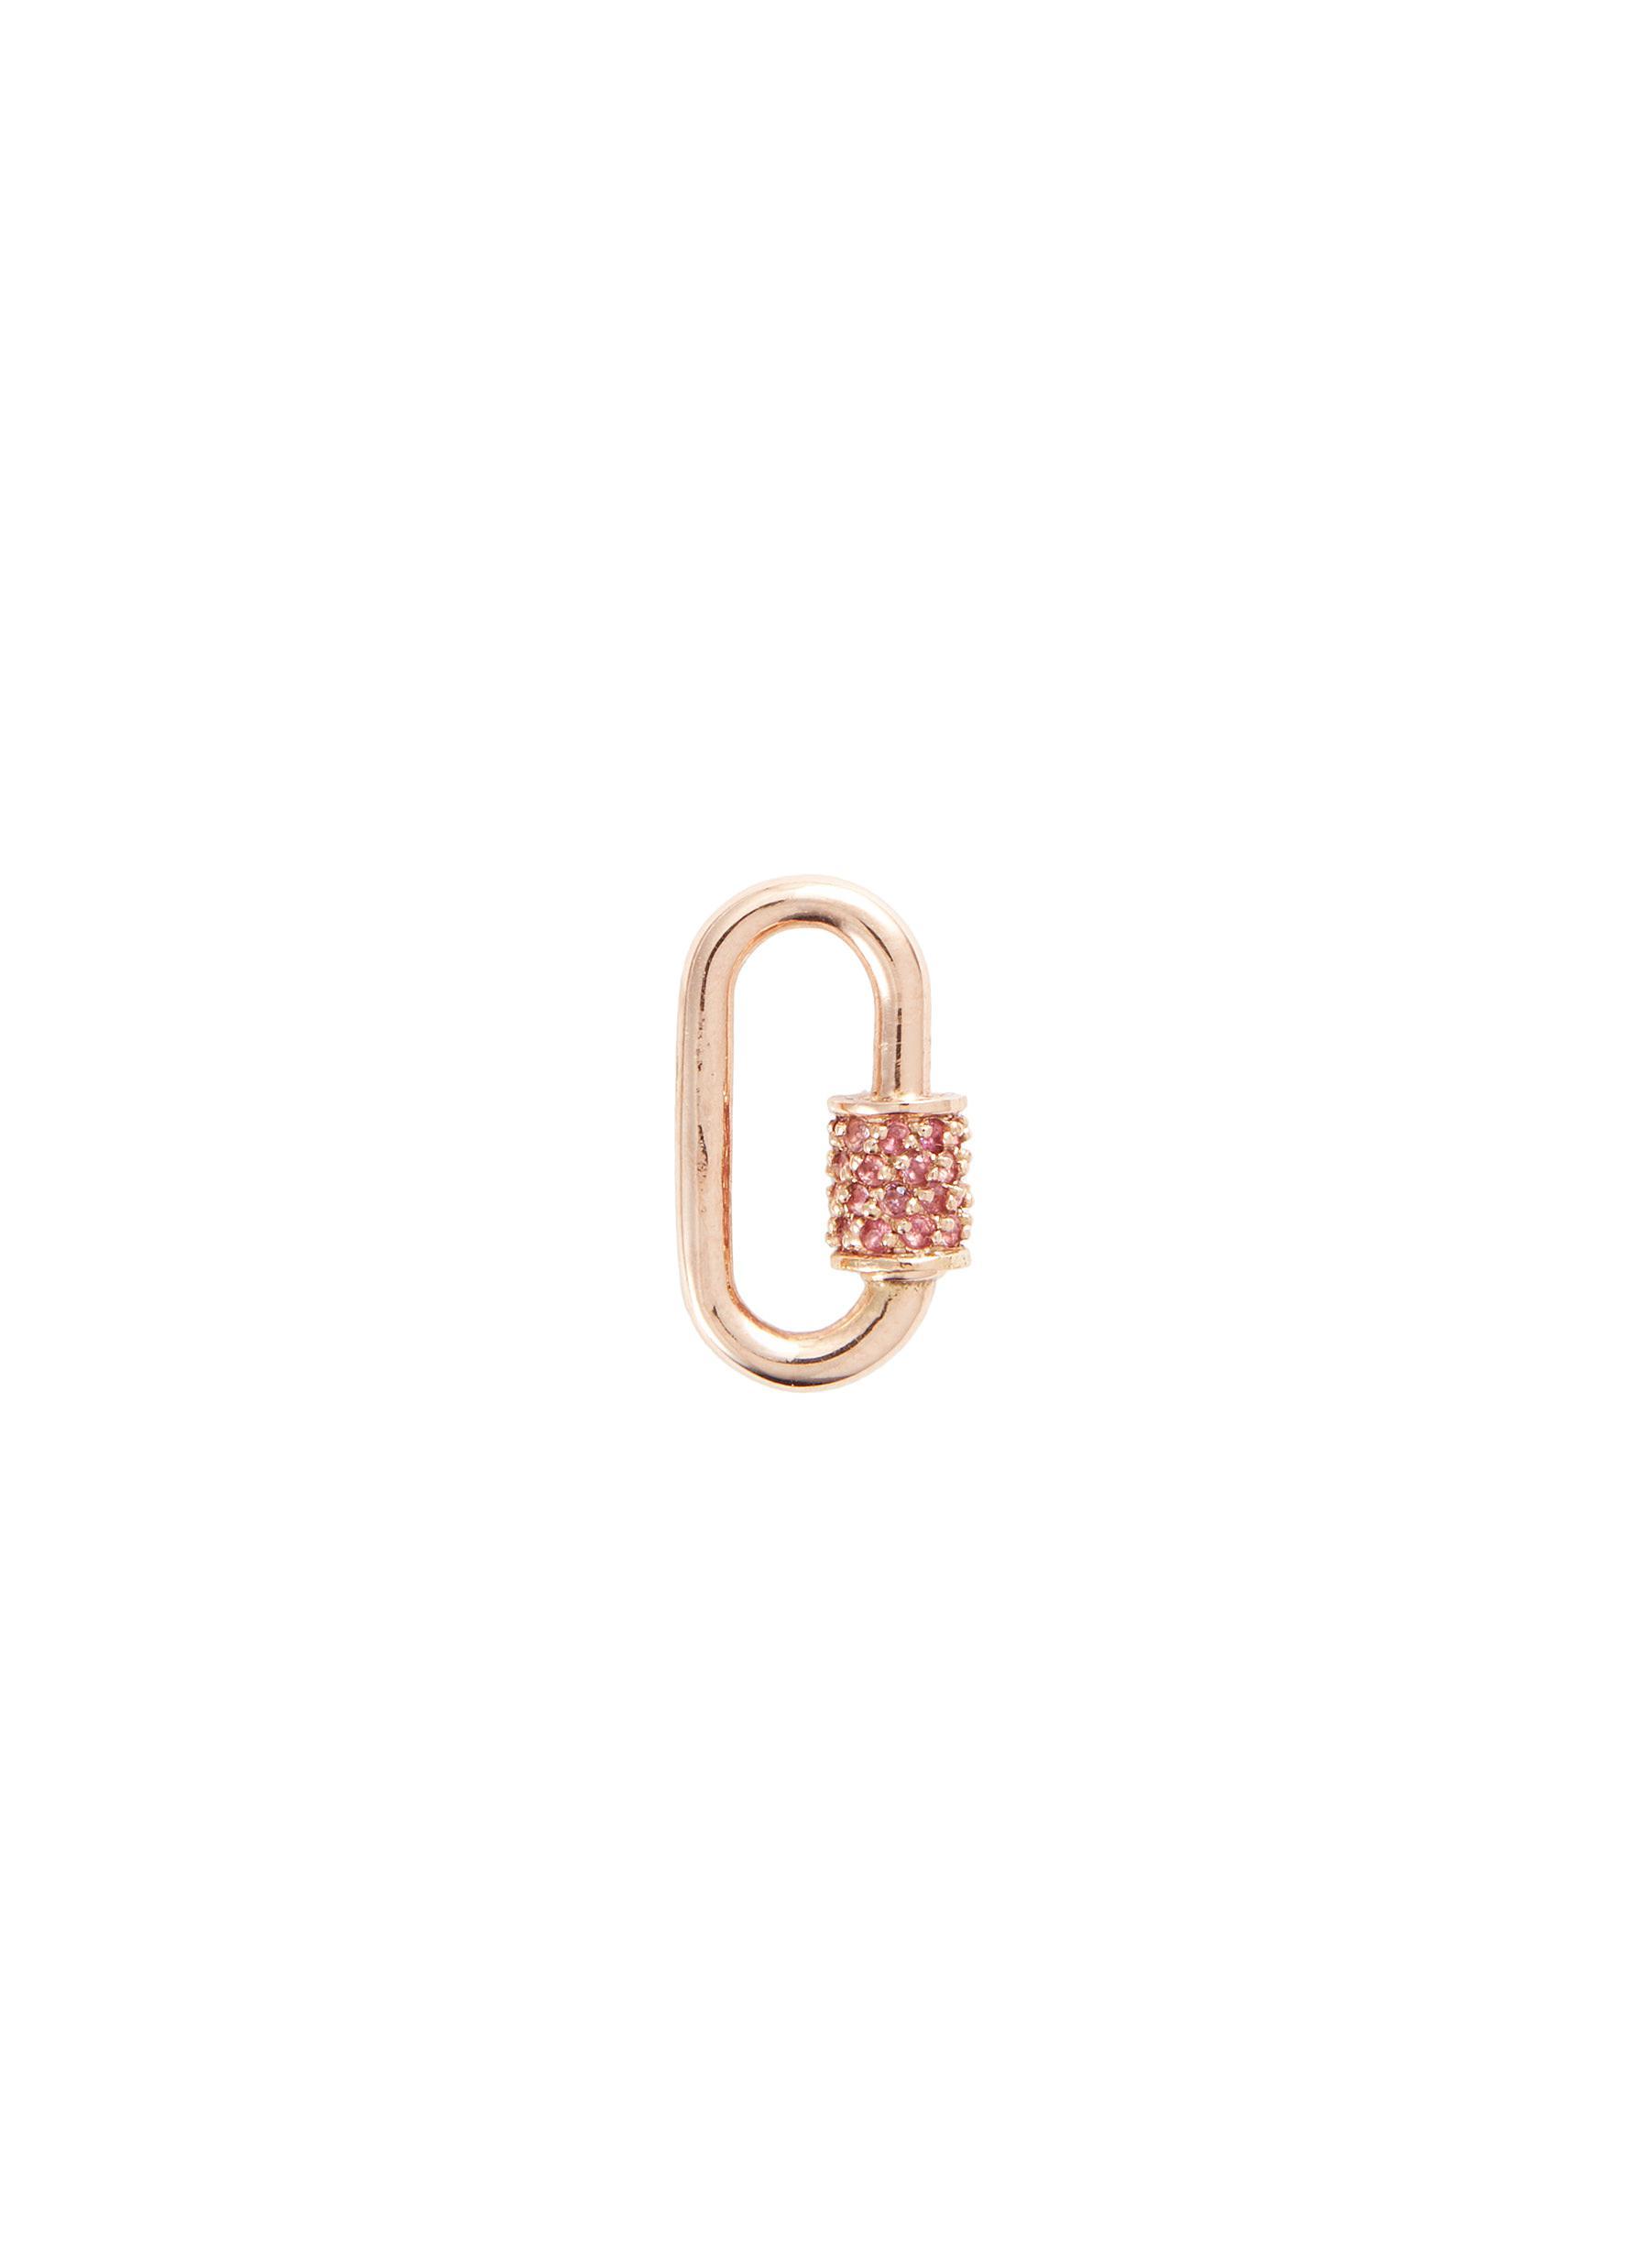 Baguette' pink sapphire 14k rose gold baby lock